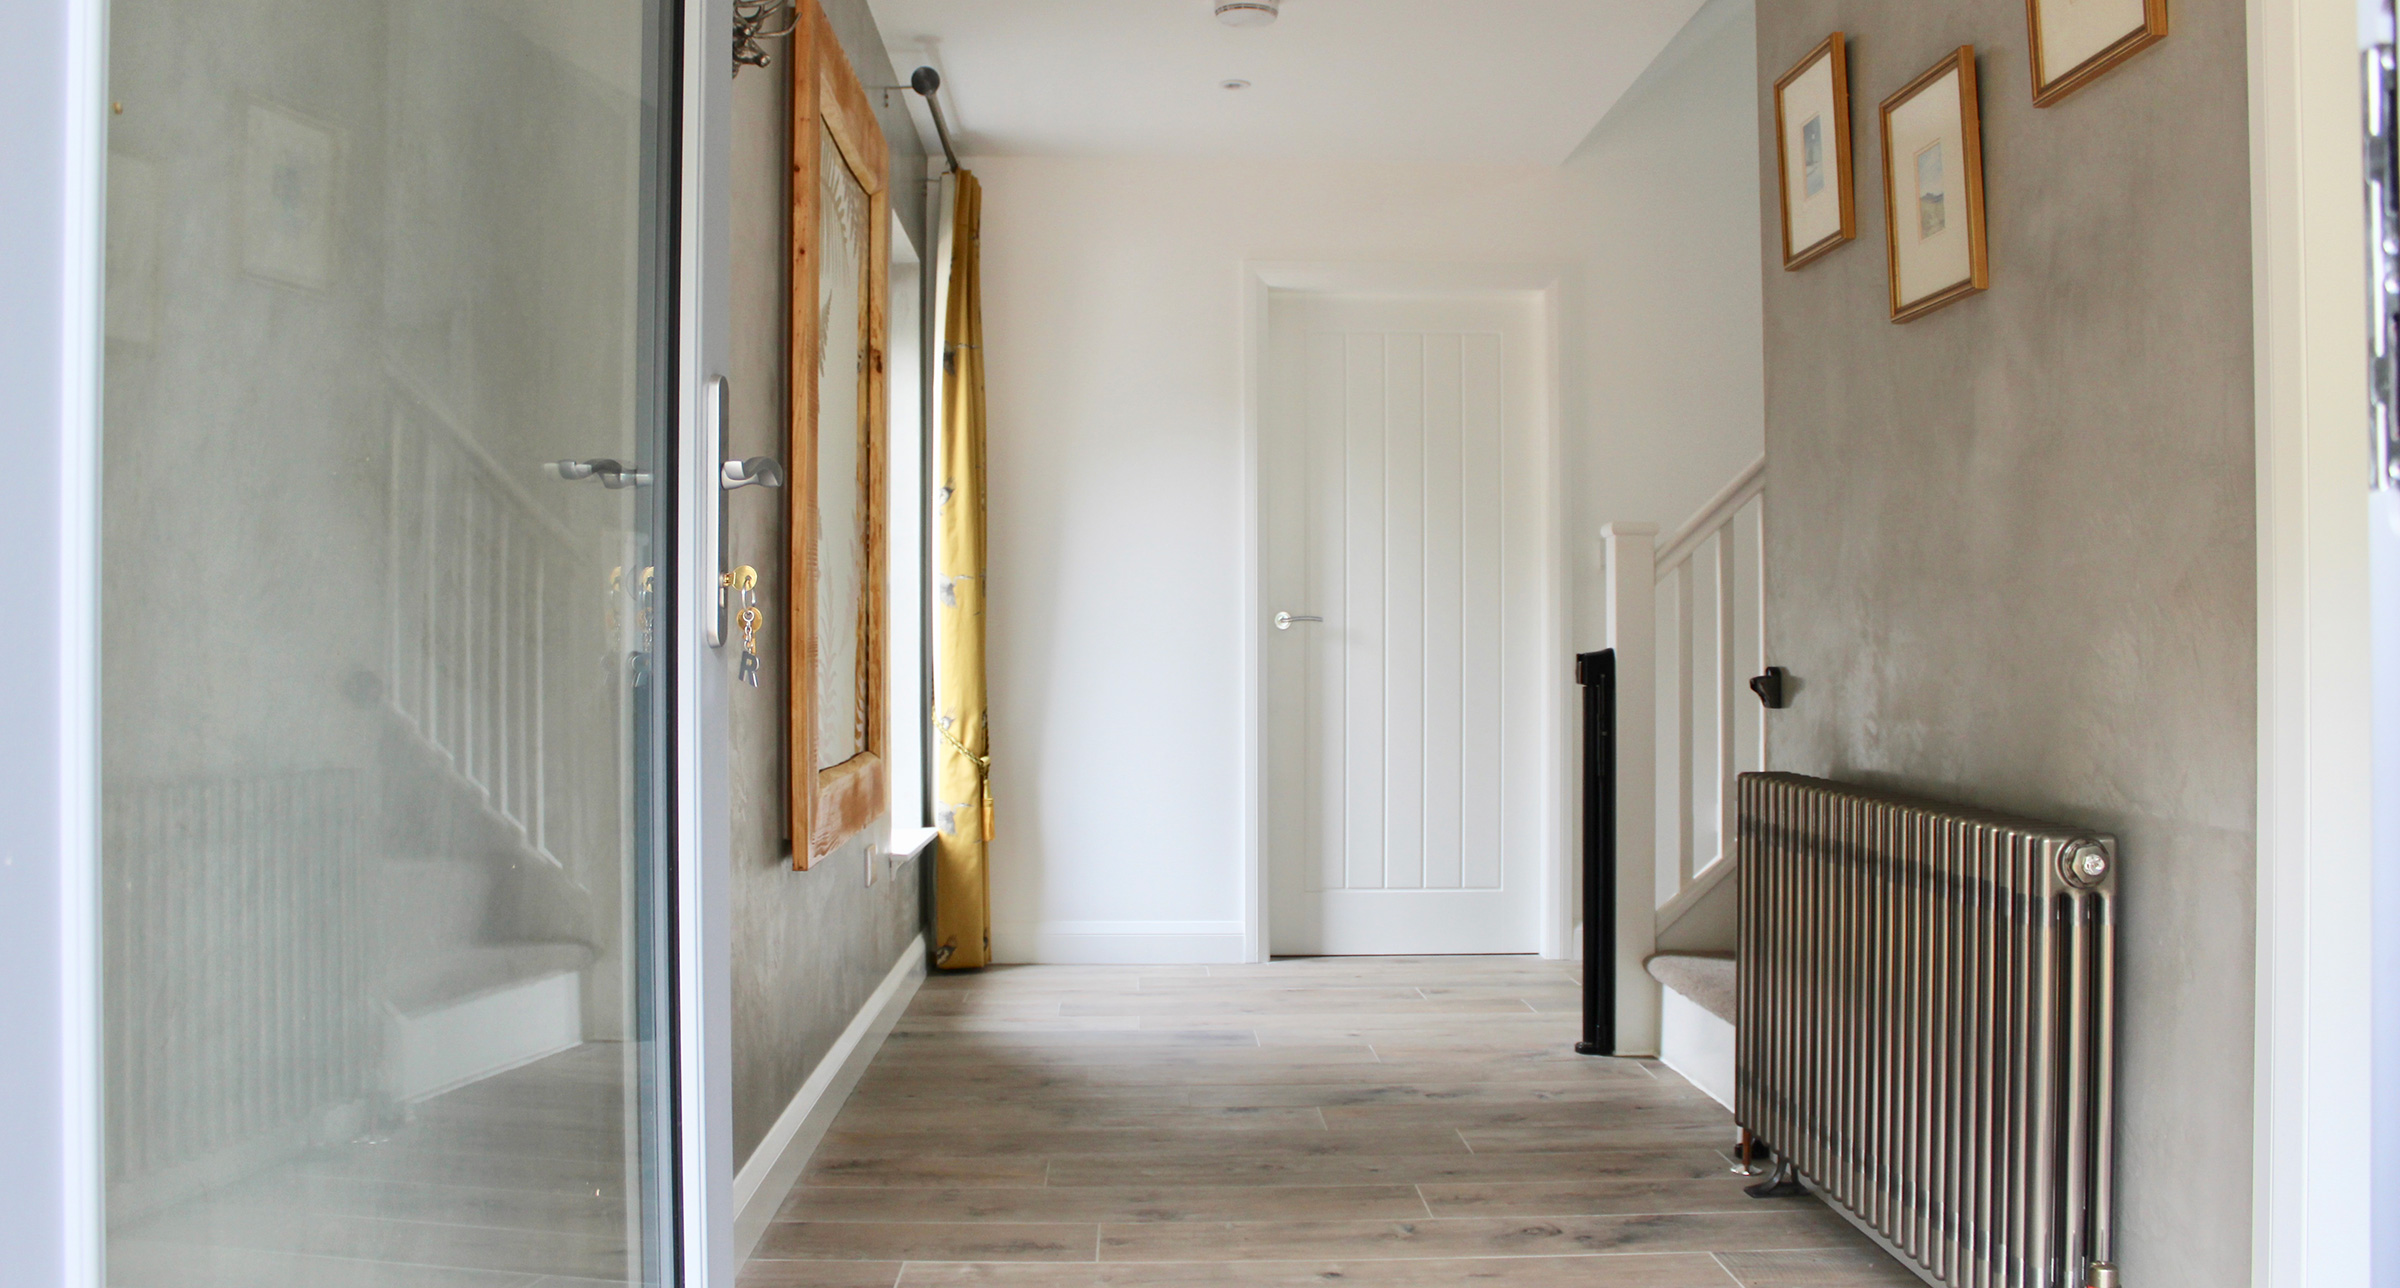 Holiday cottage hallway